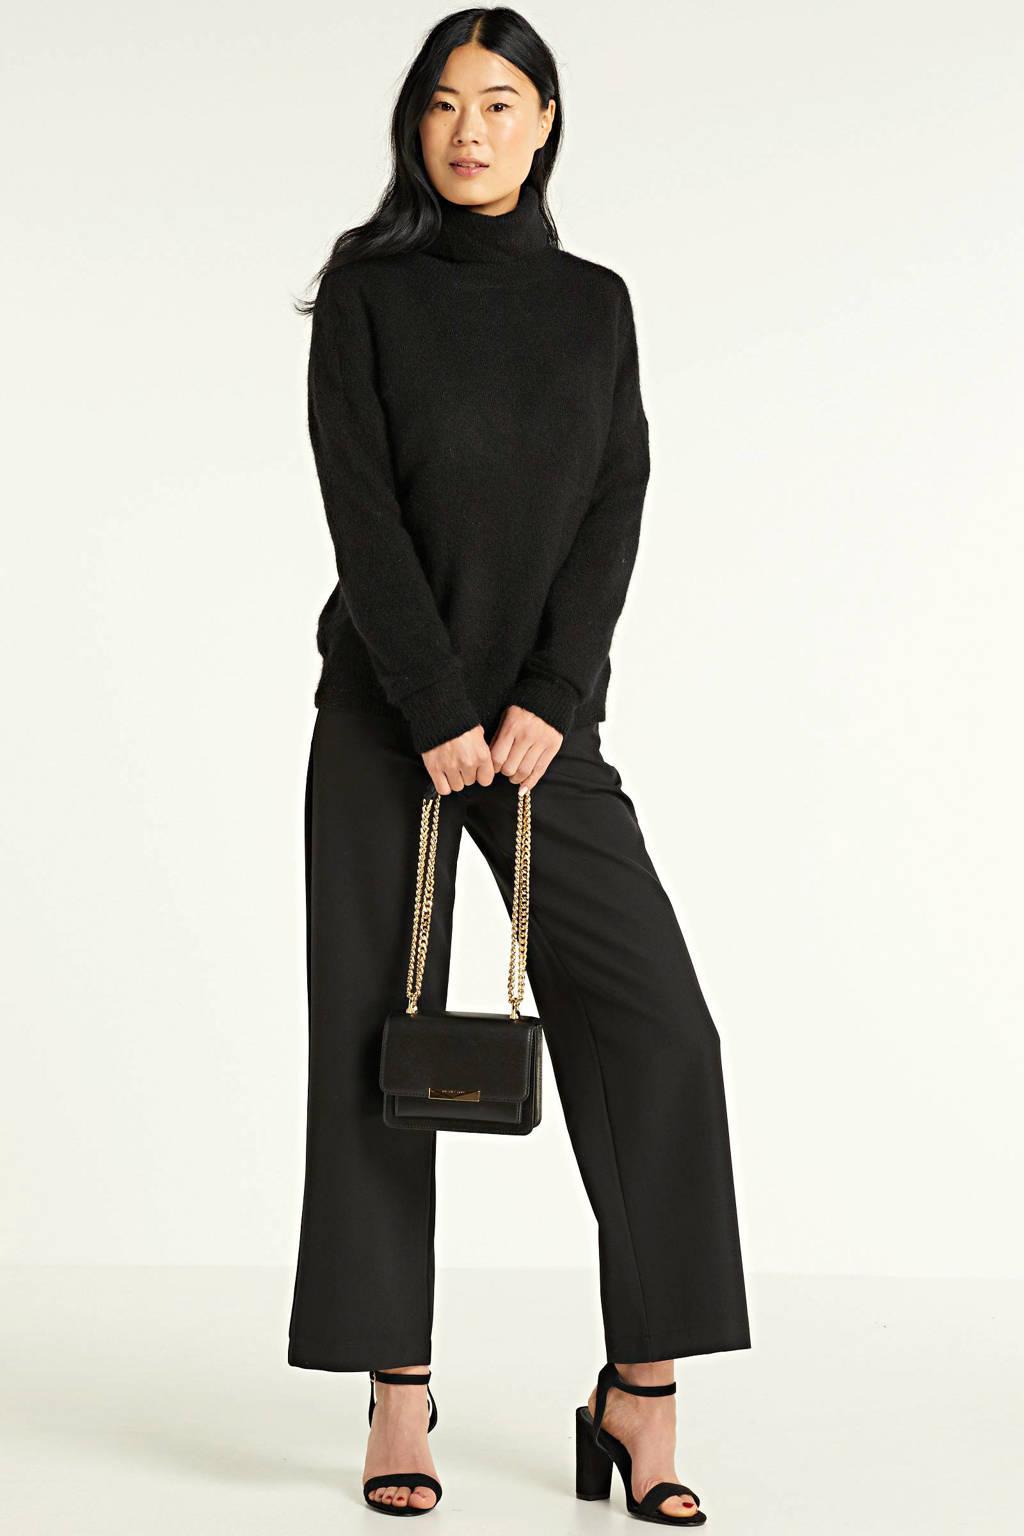 MSCH Copenhagen gemêleerde coltrui Femme Alpaca Roll Neck met wol zwart, Zwart